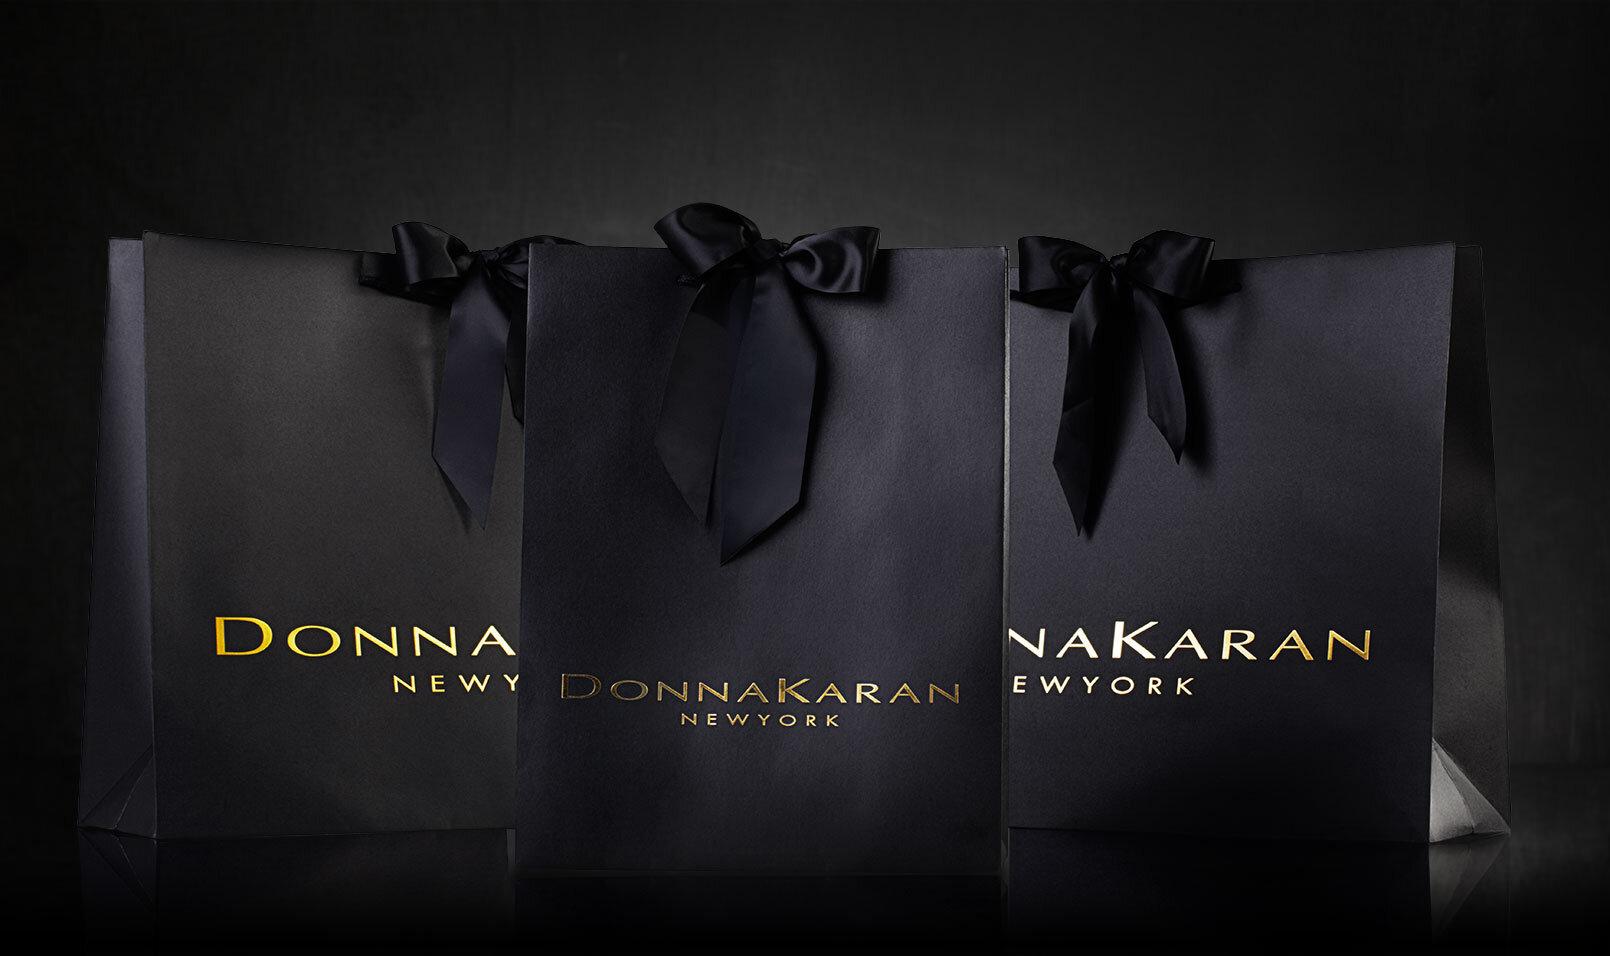 DKNY-DONNA-KARAN-NEW-York-Shopping-Bag-Design-Packaging-Company-1.jpg